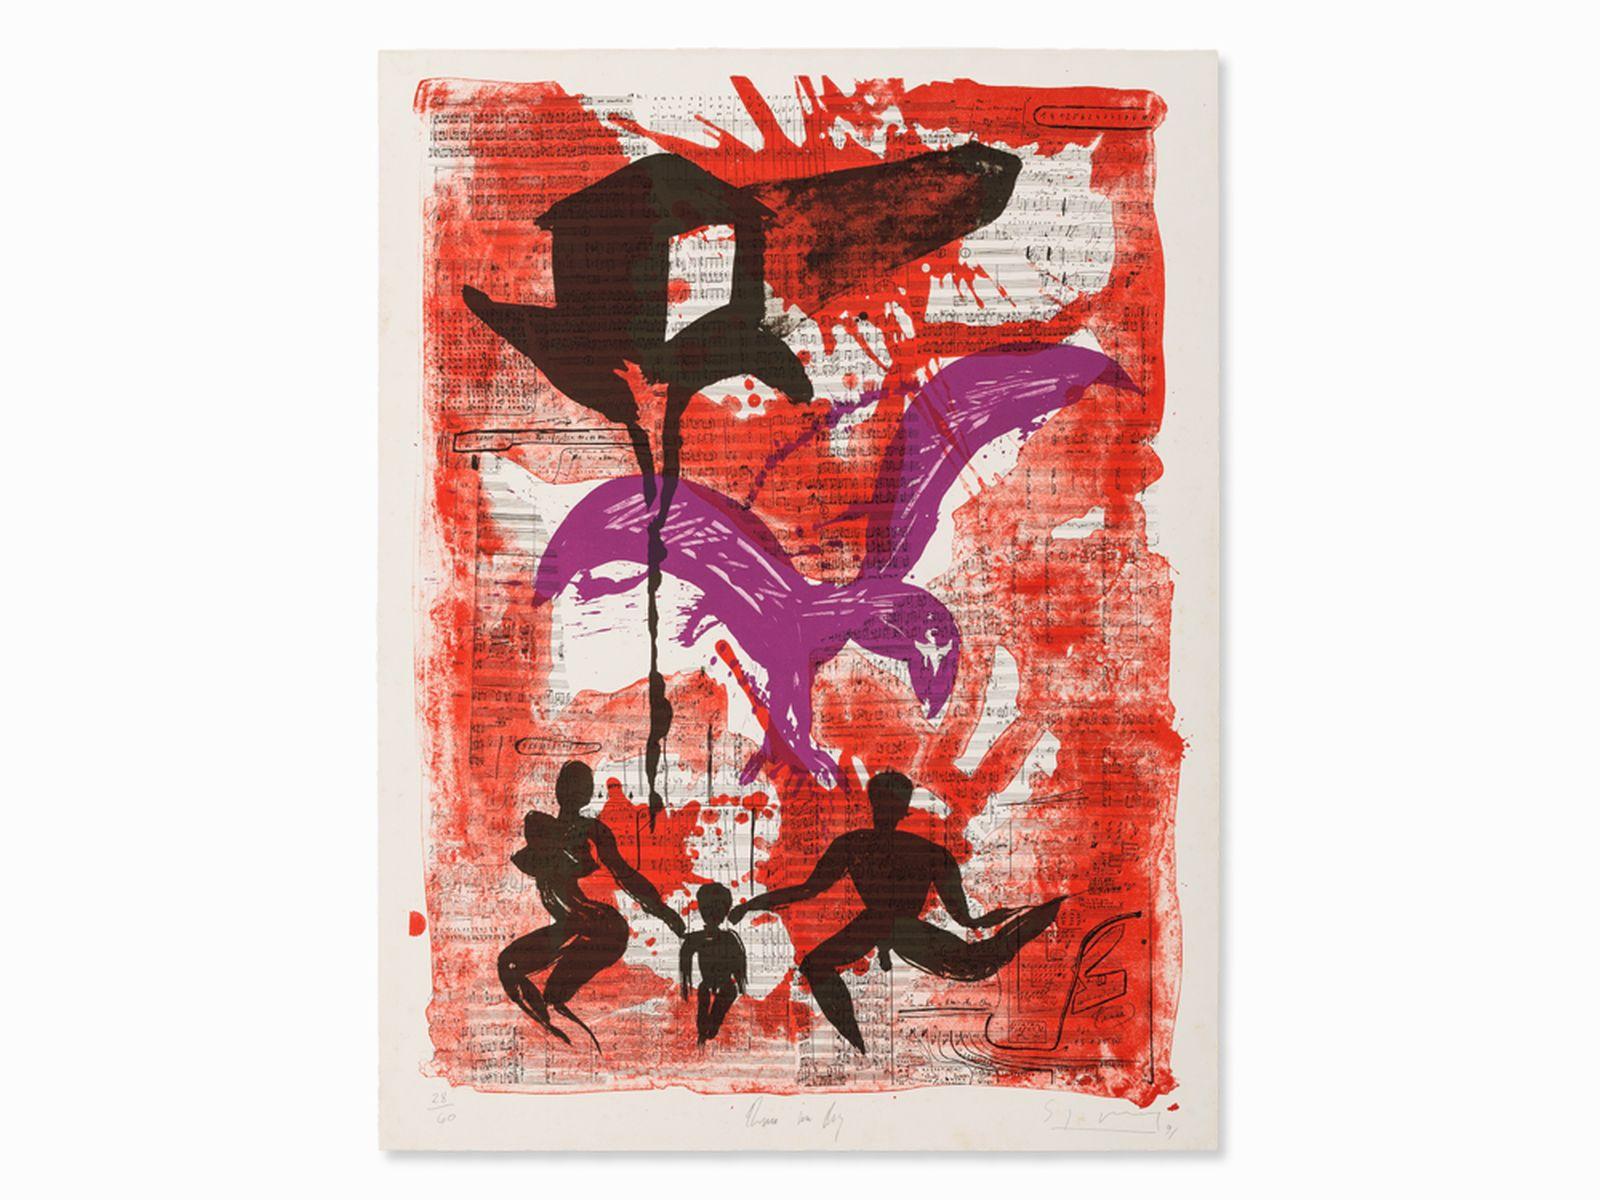 "#131 Stefan Szczesny, Lithograph, 'Dark House', Germany, 1991 | Stefan Szczesny (geb. 1951) , Lithografie, ""Dunkles Haus"", Deutschland, 1991 Image"